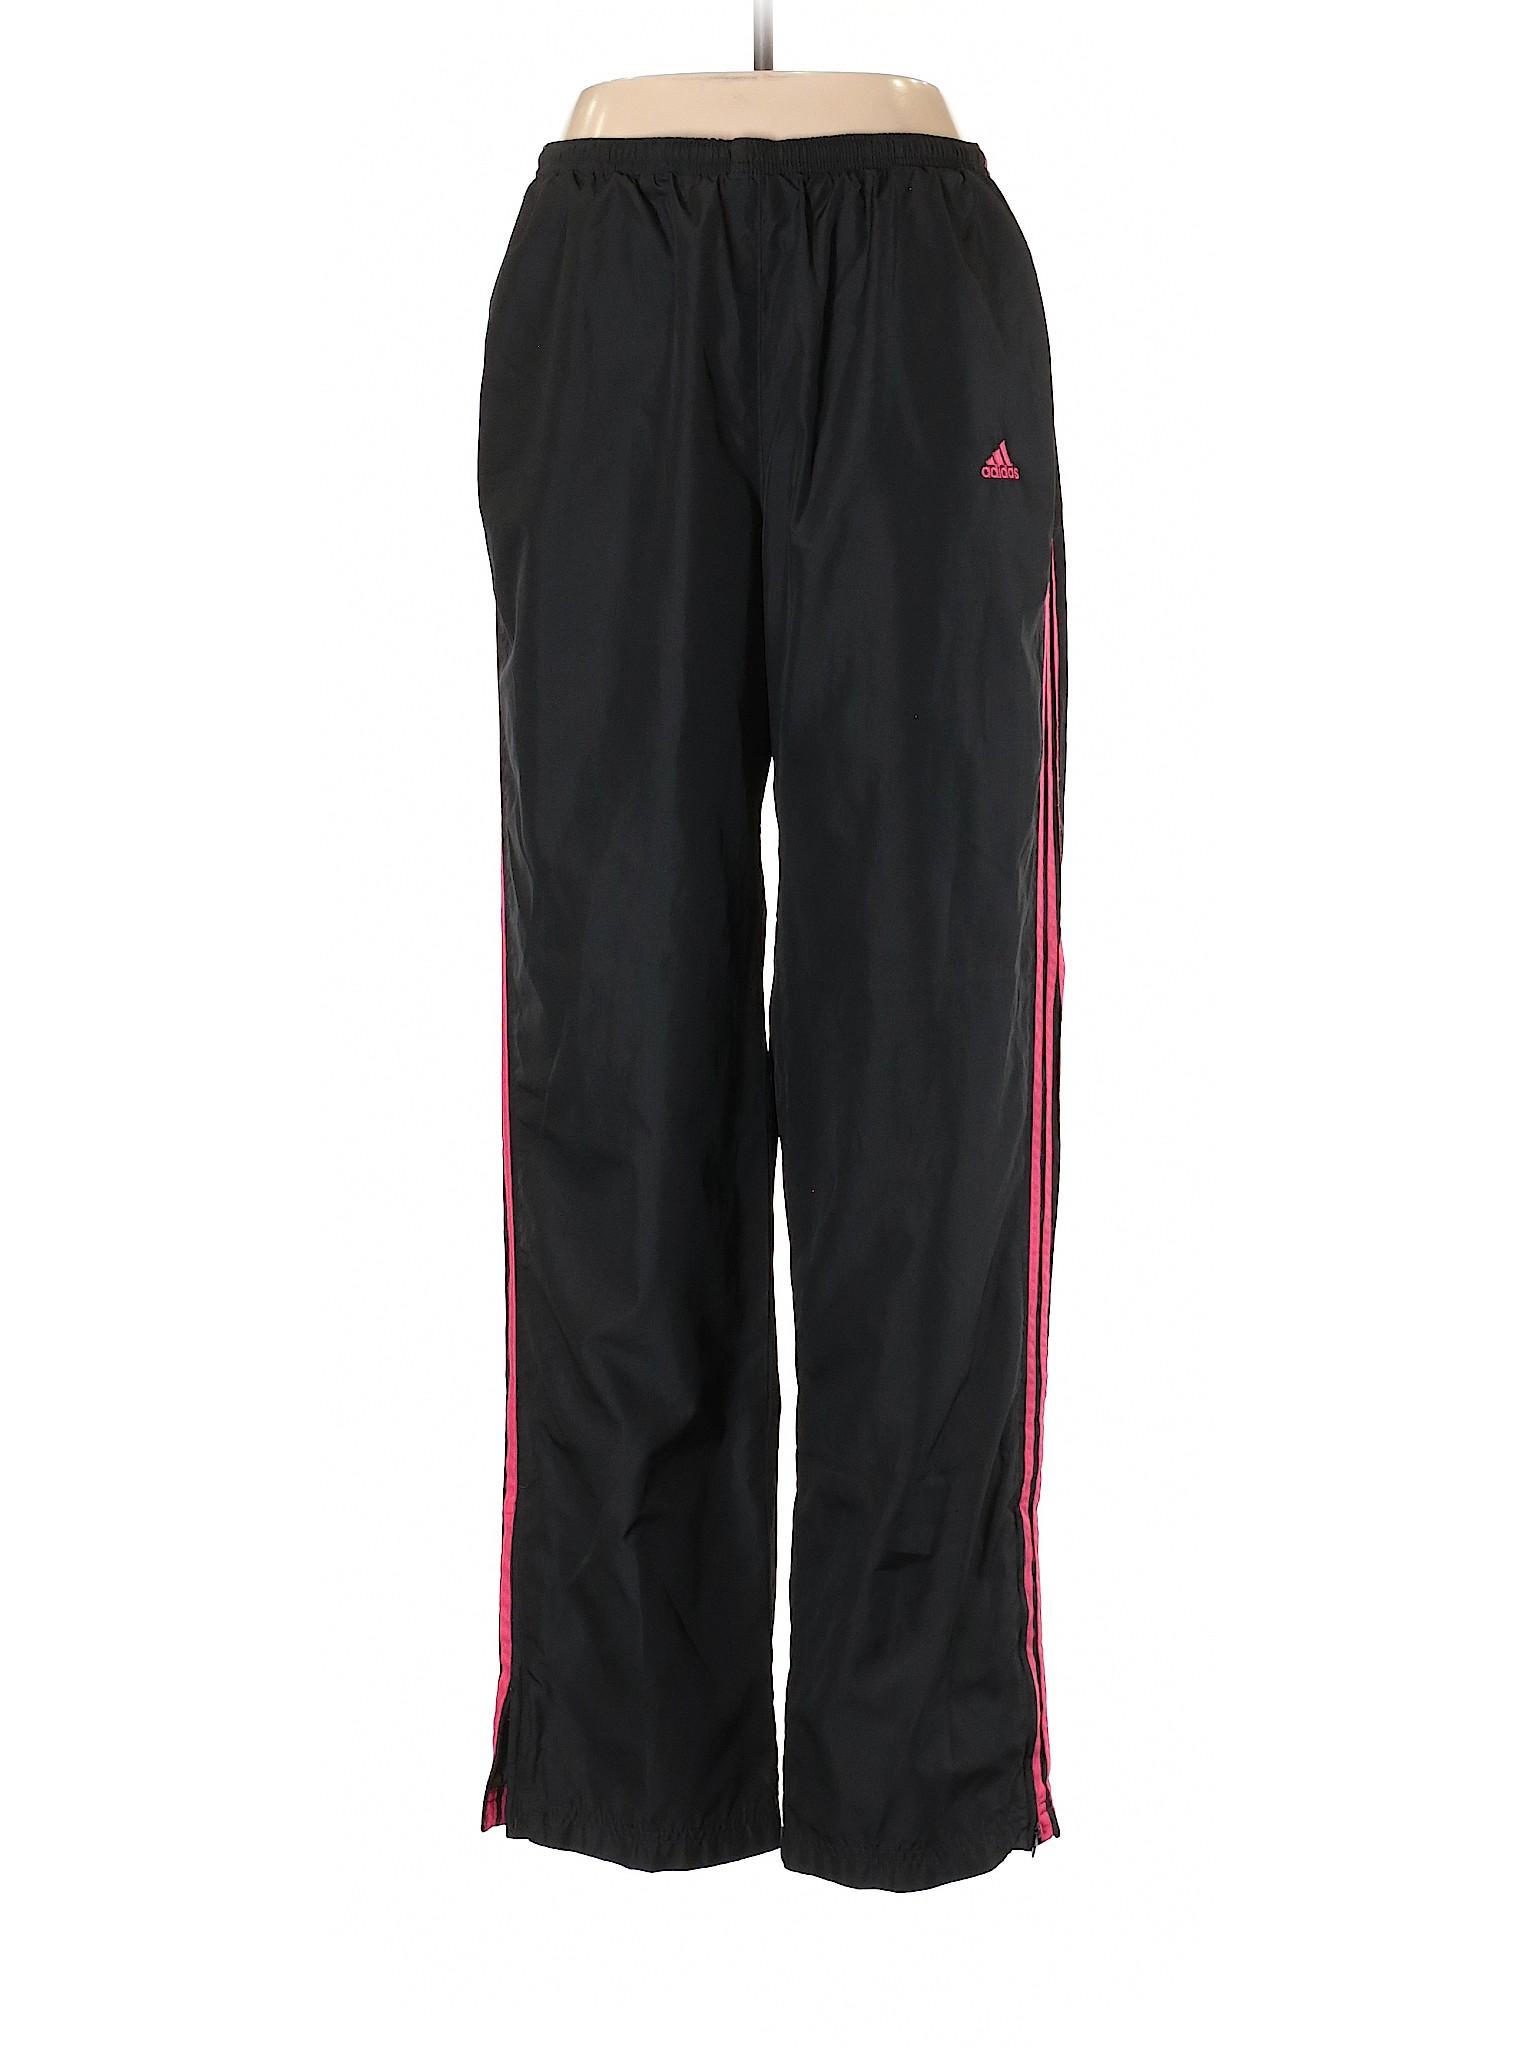 Track Pants Leisure Adidas Leisure winter winter aqwxIXnZ